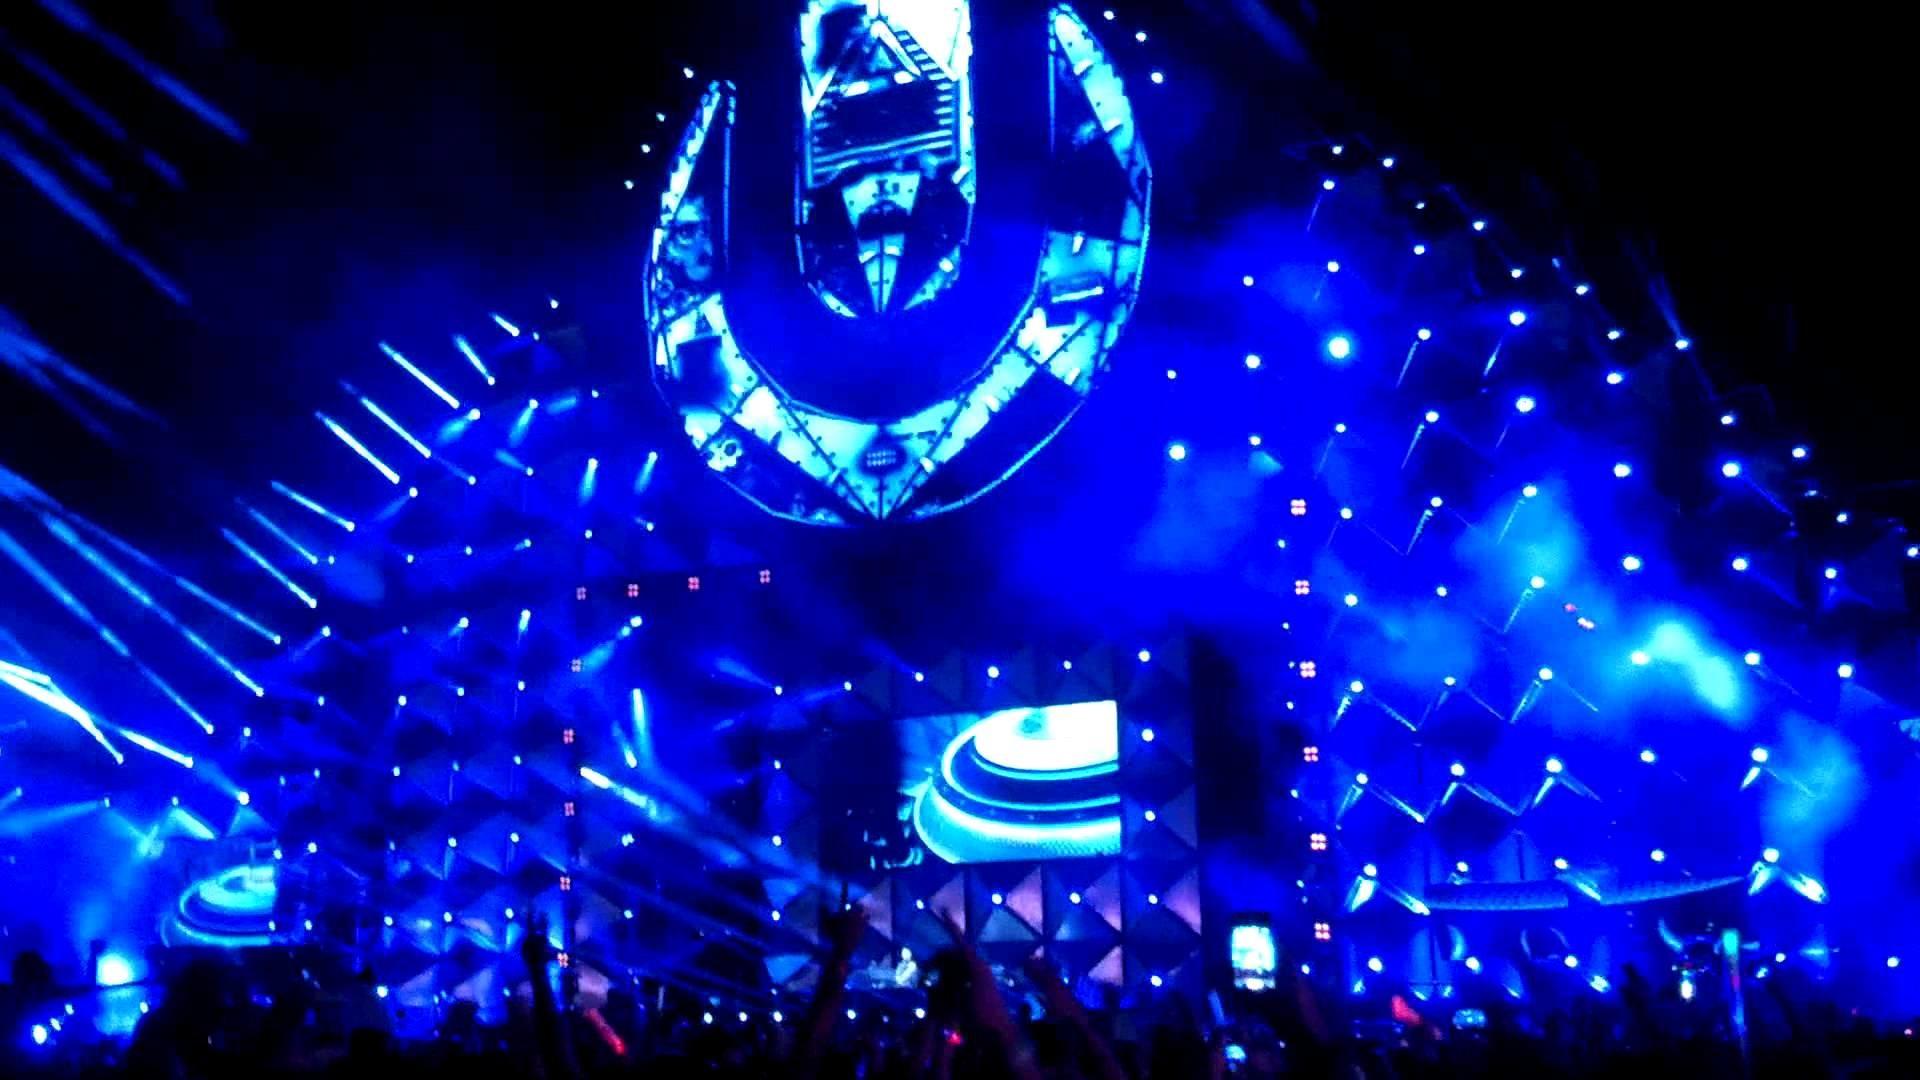 Ultra Music Festival Wallpaper Background : Music Wallpaper – Petsprin